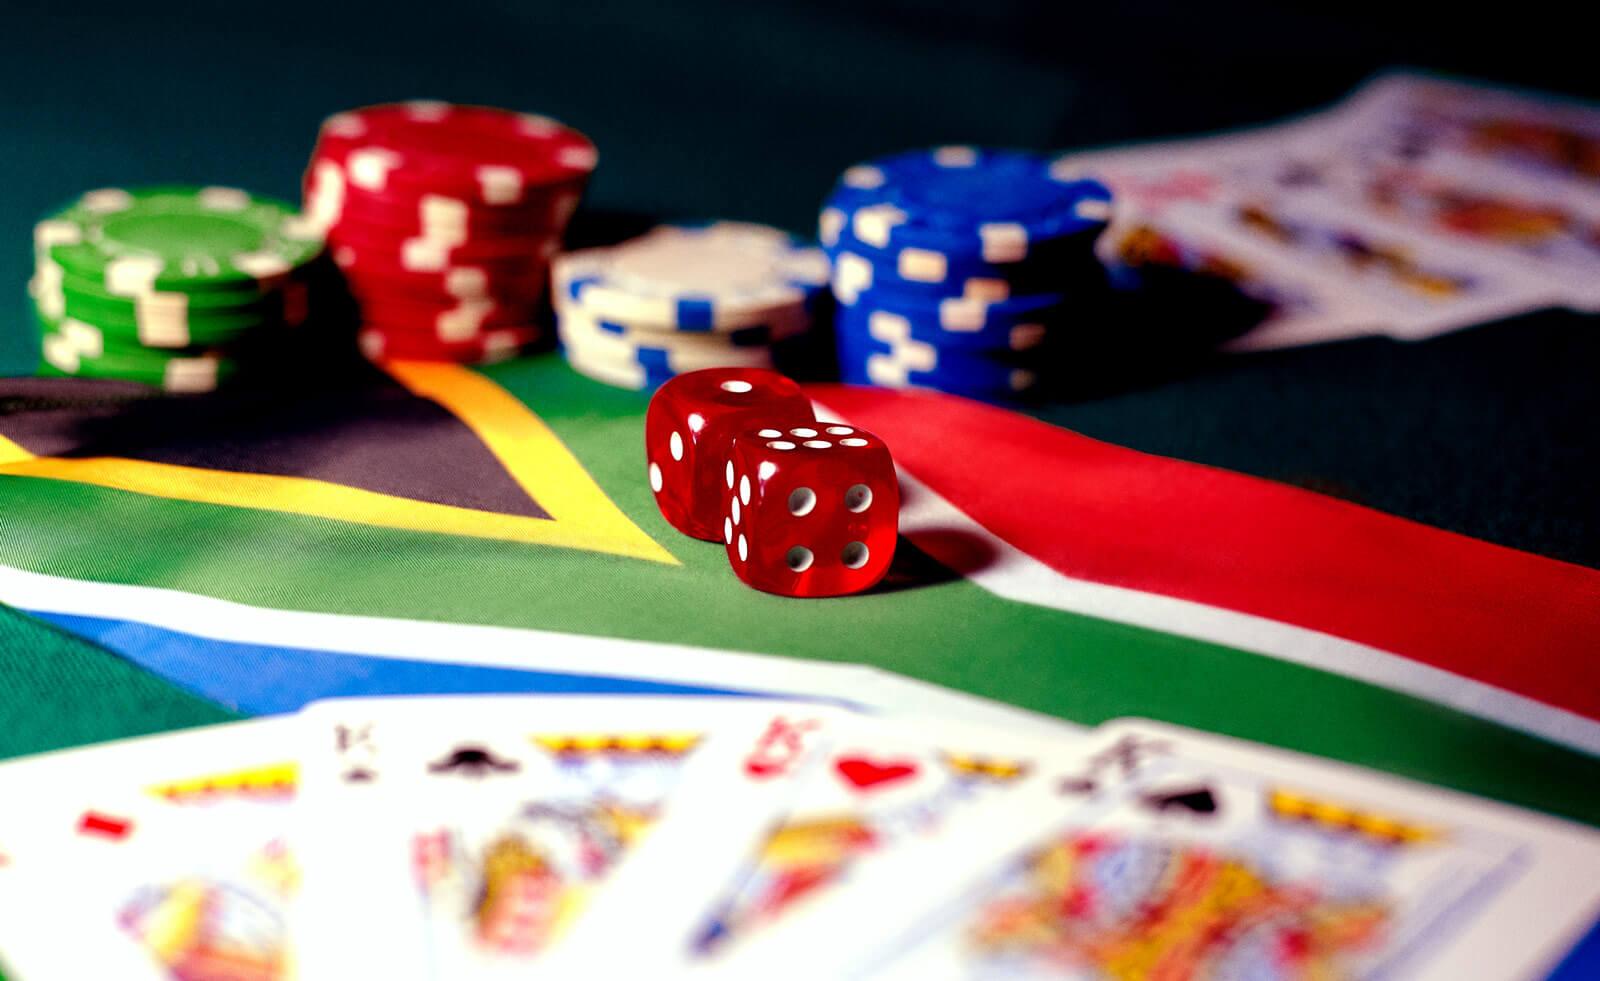 Gambling Casino Card Game Poker